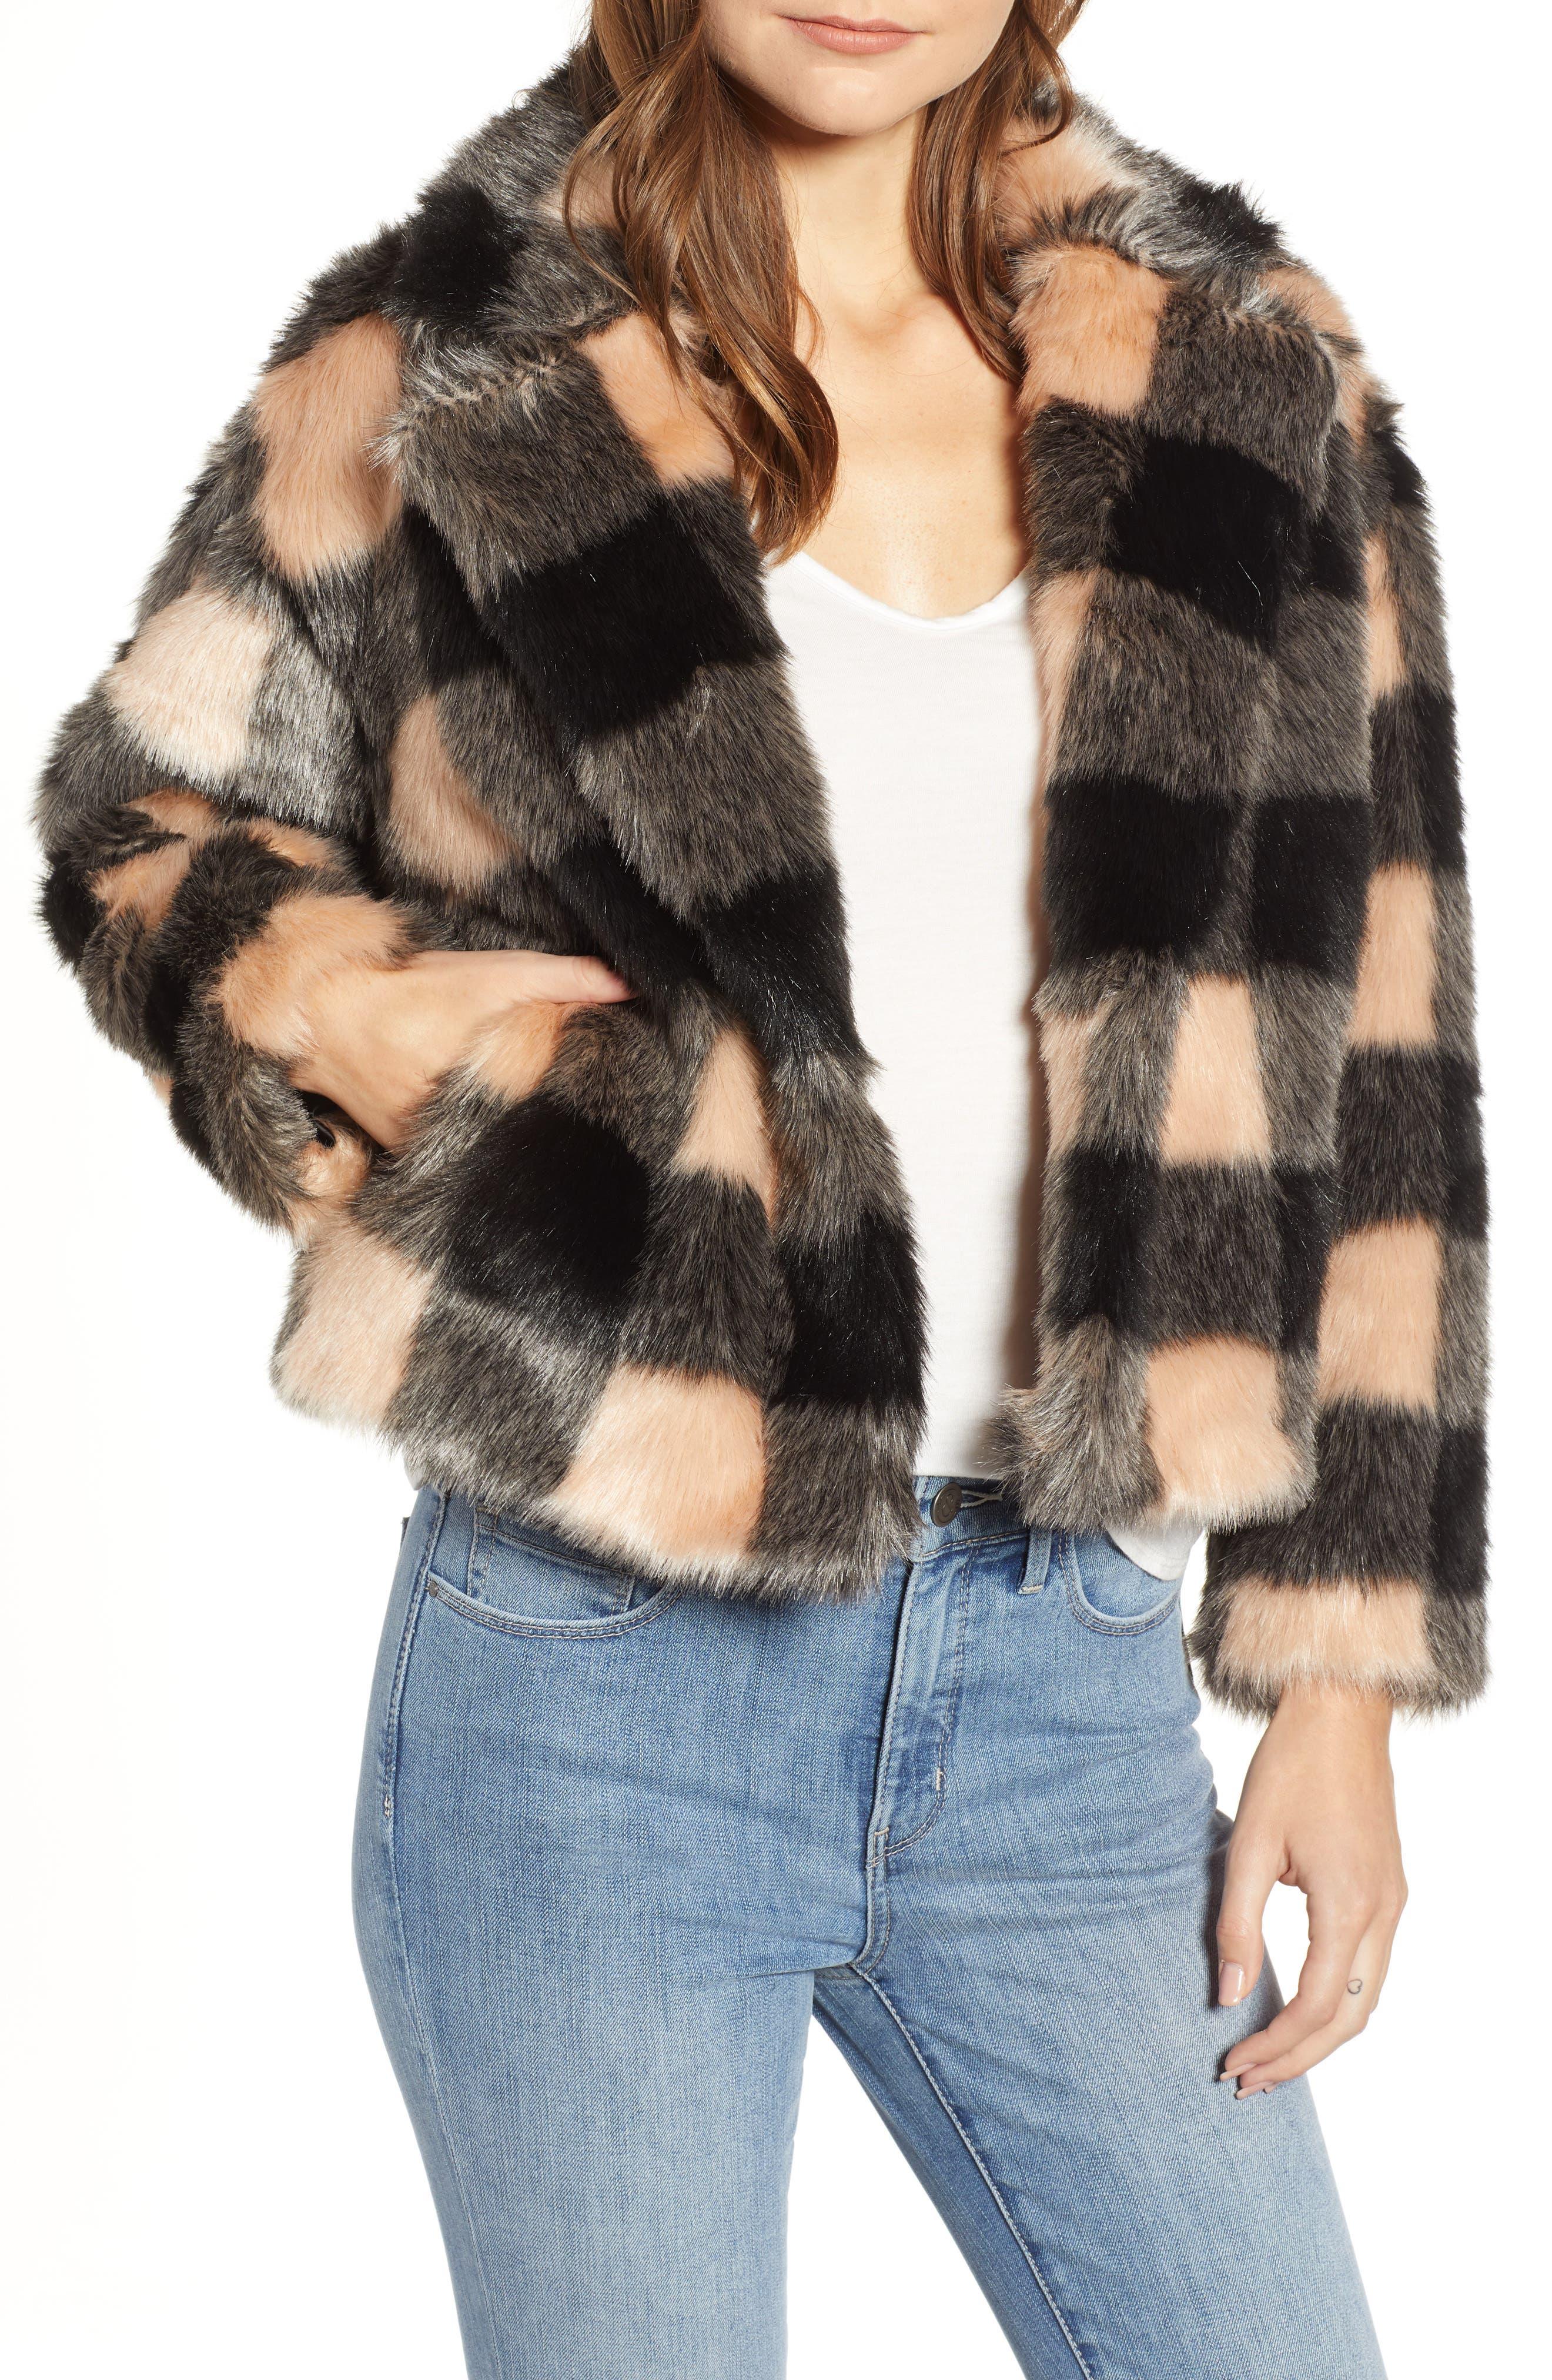 HEARTLOOM Aria Faux Fur Coat in Check